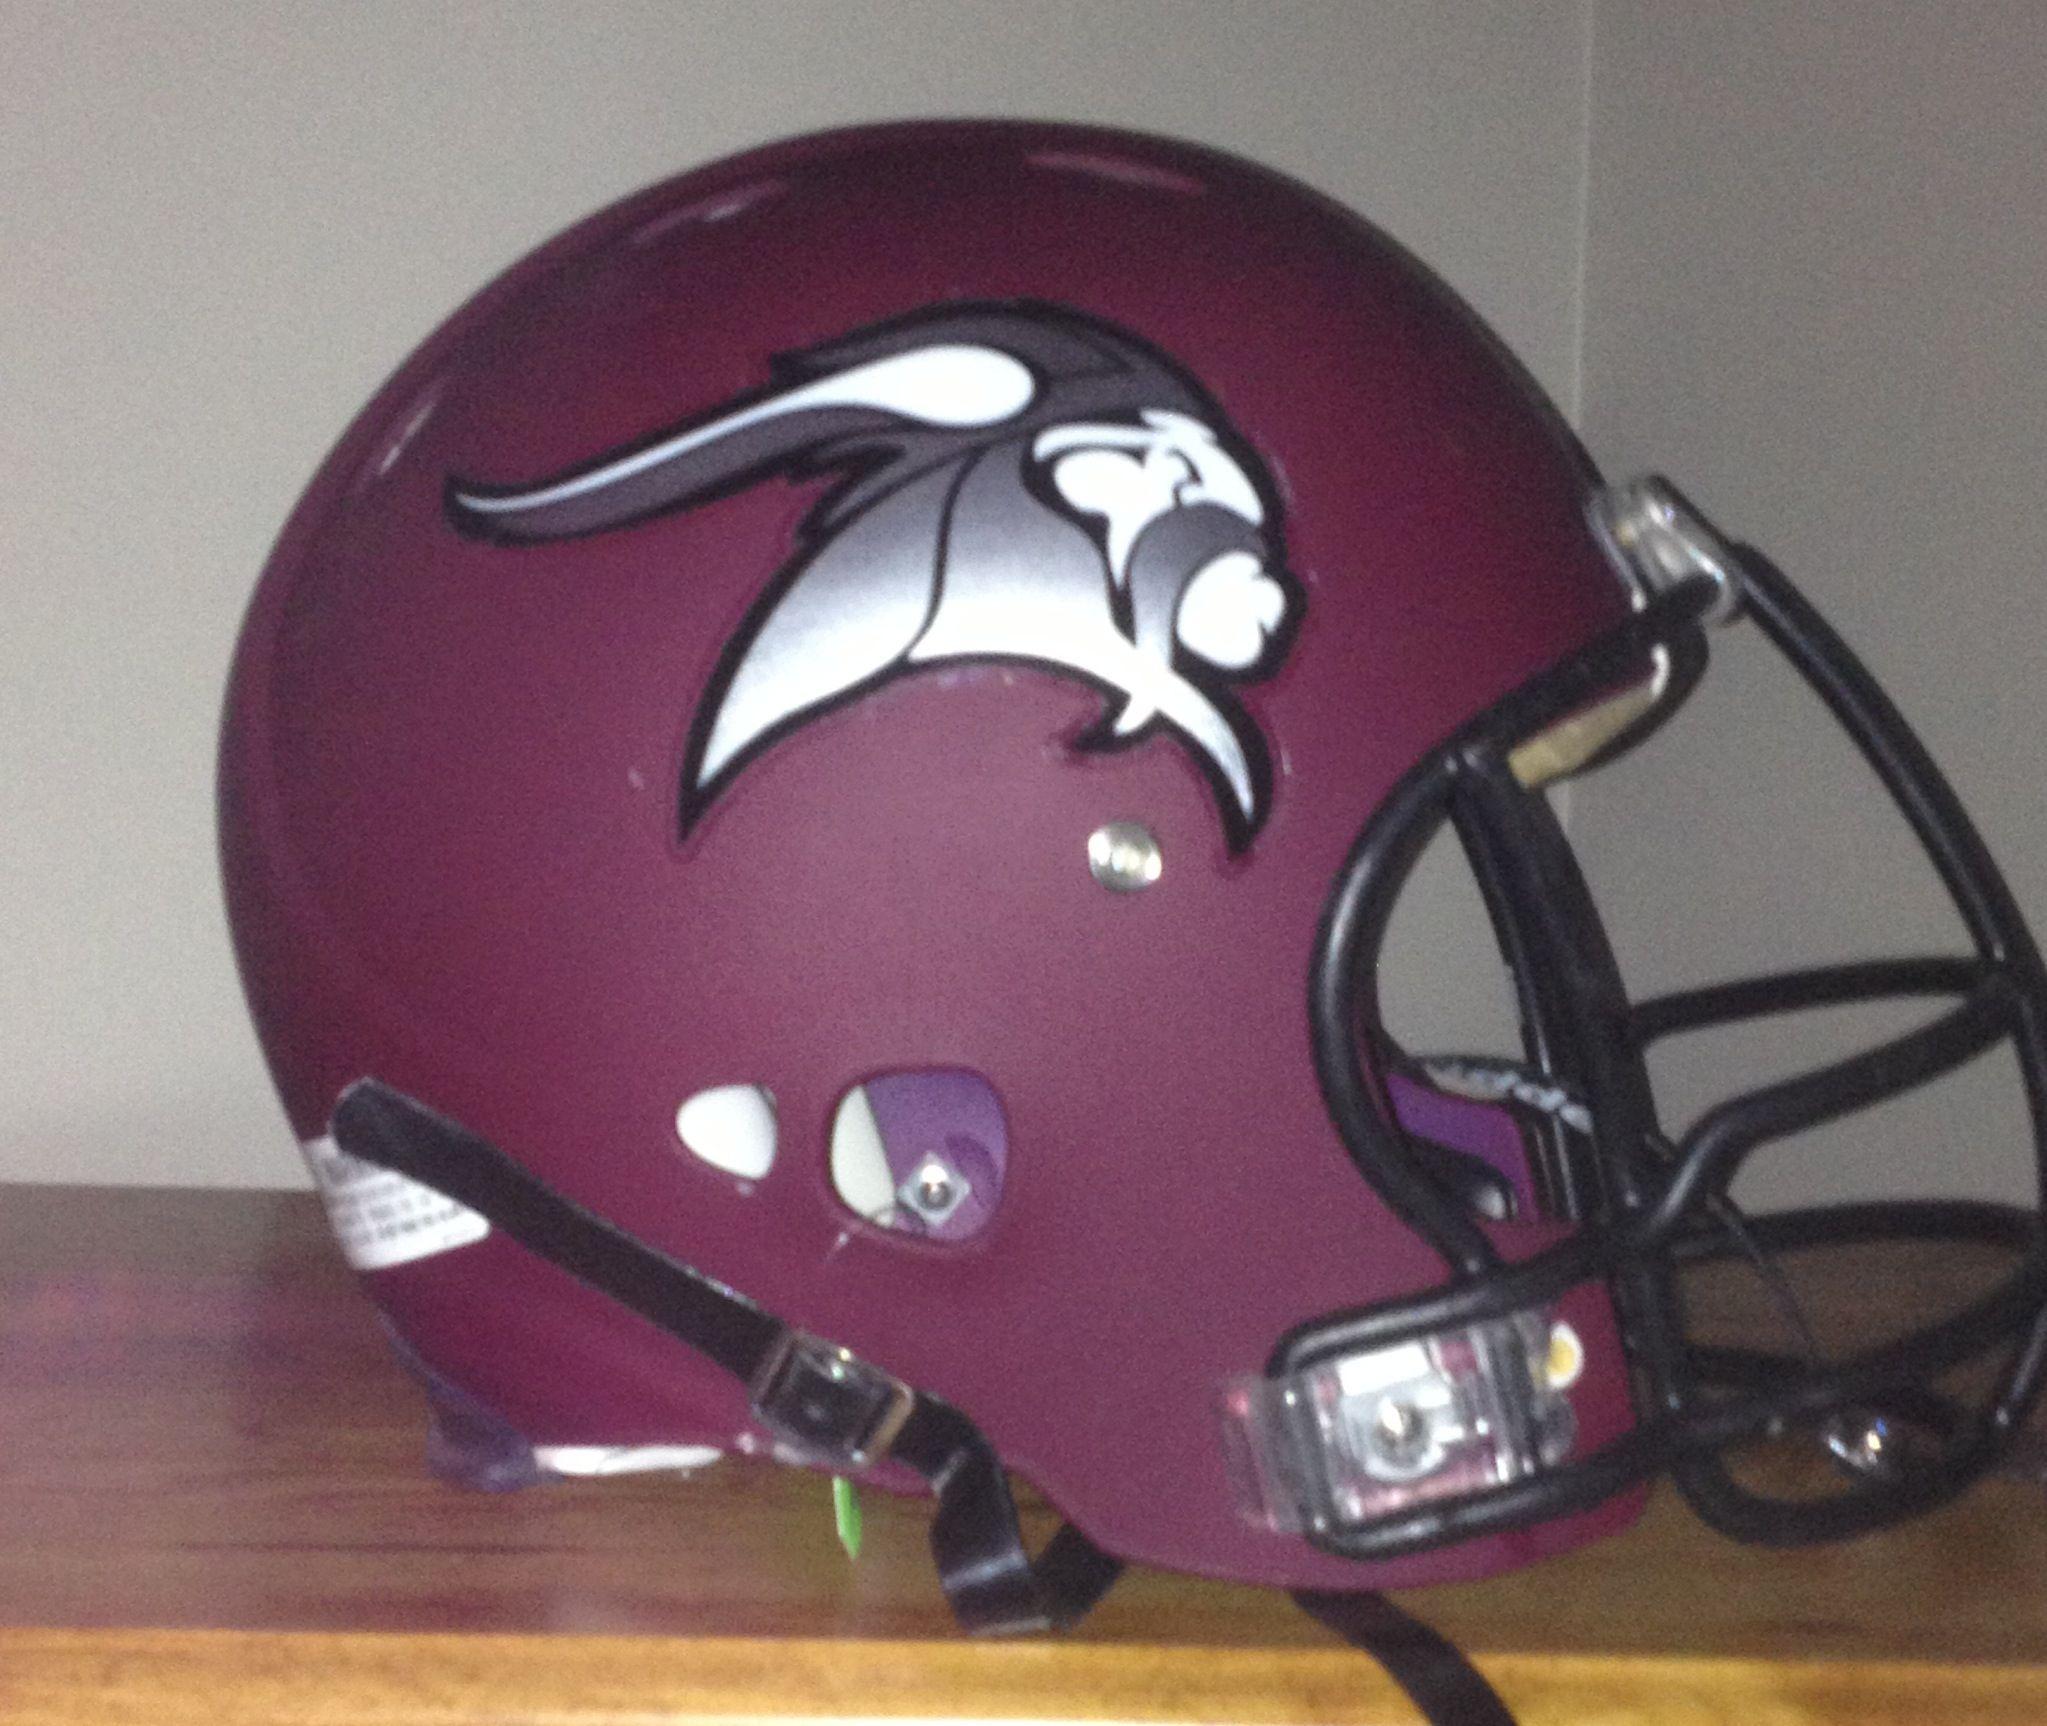 New Chrome Football Helmet Decal Look For Waterloo High School - Helmet decalsfootball helmet decals business art designs